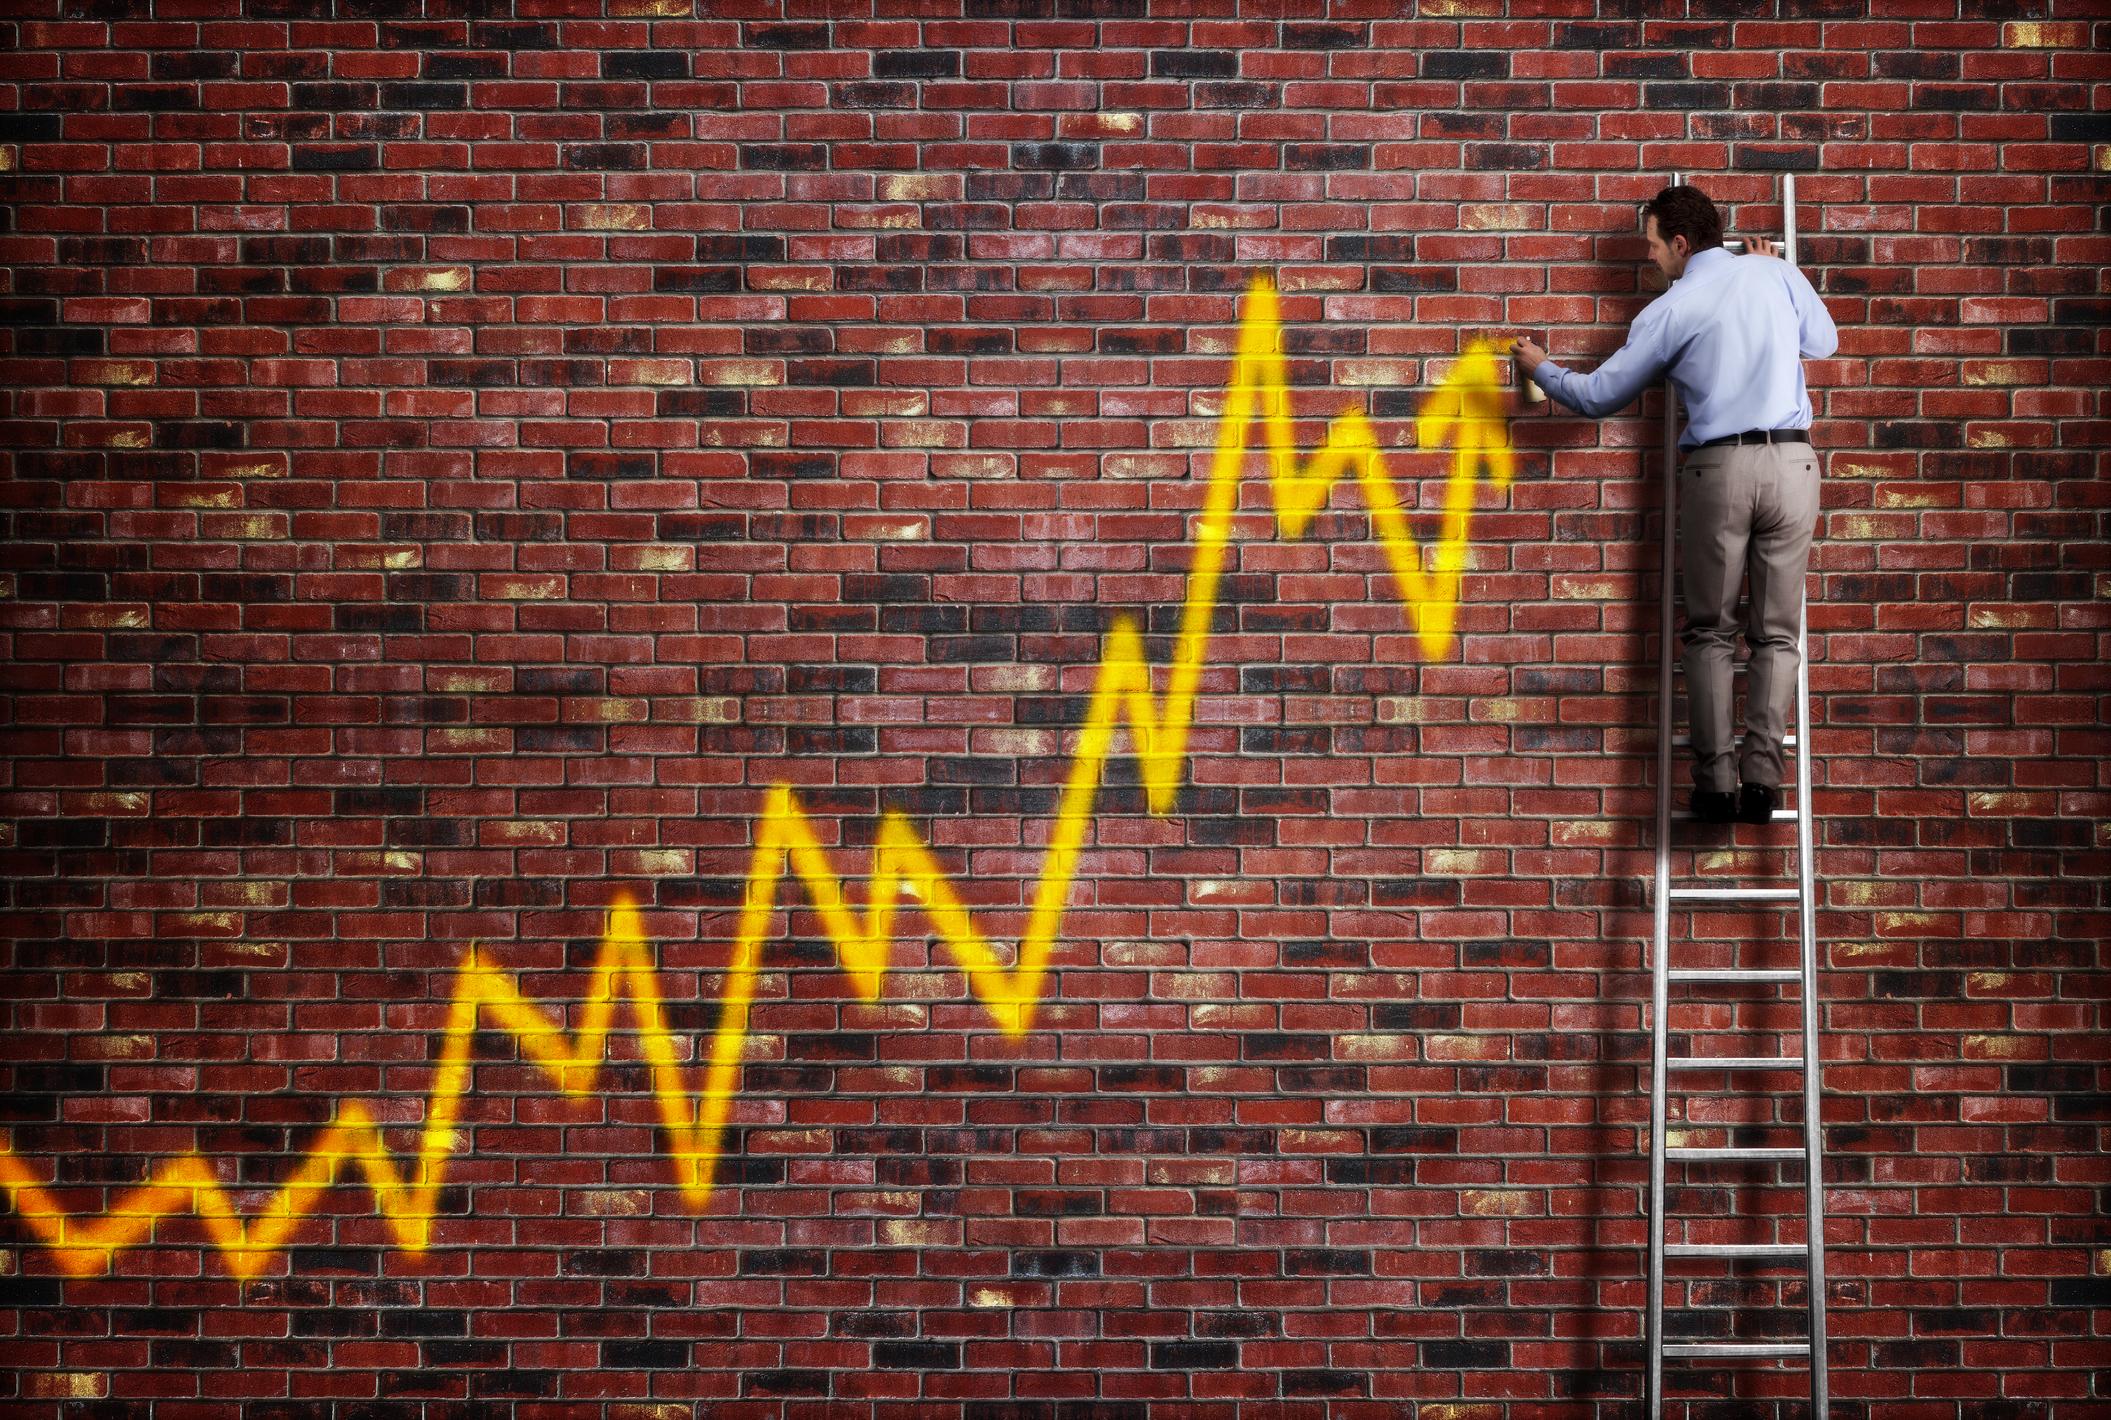 A man paints a stock chart on a brick wall.